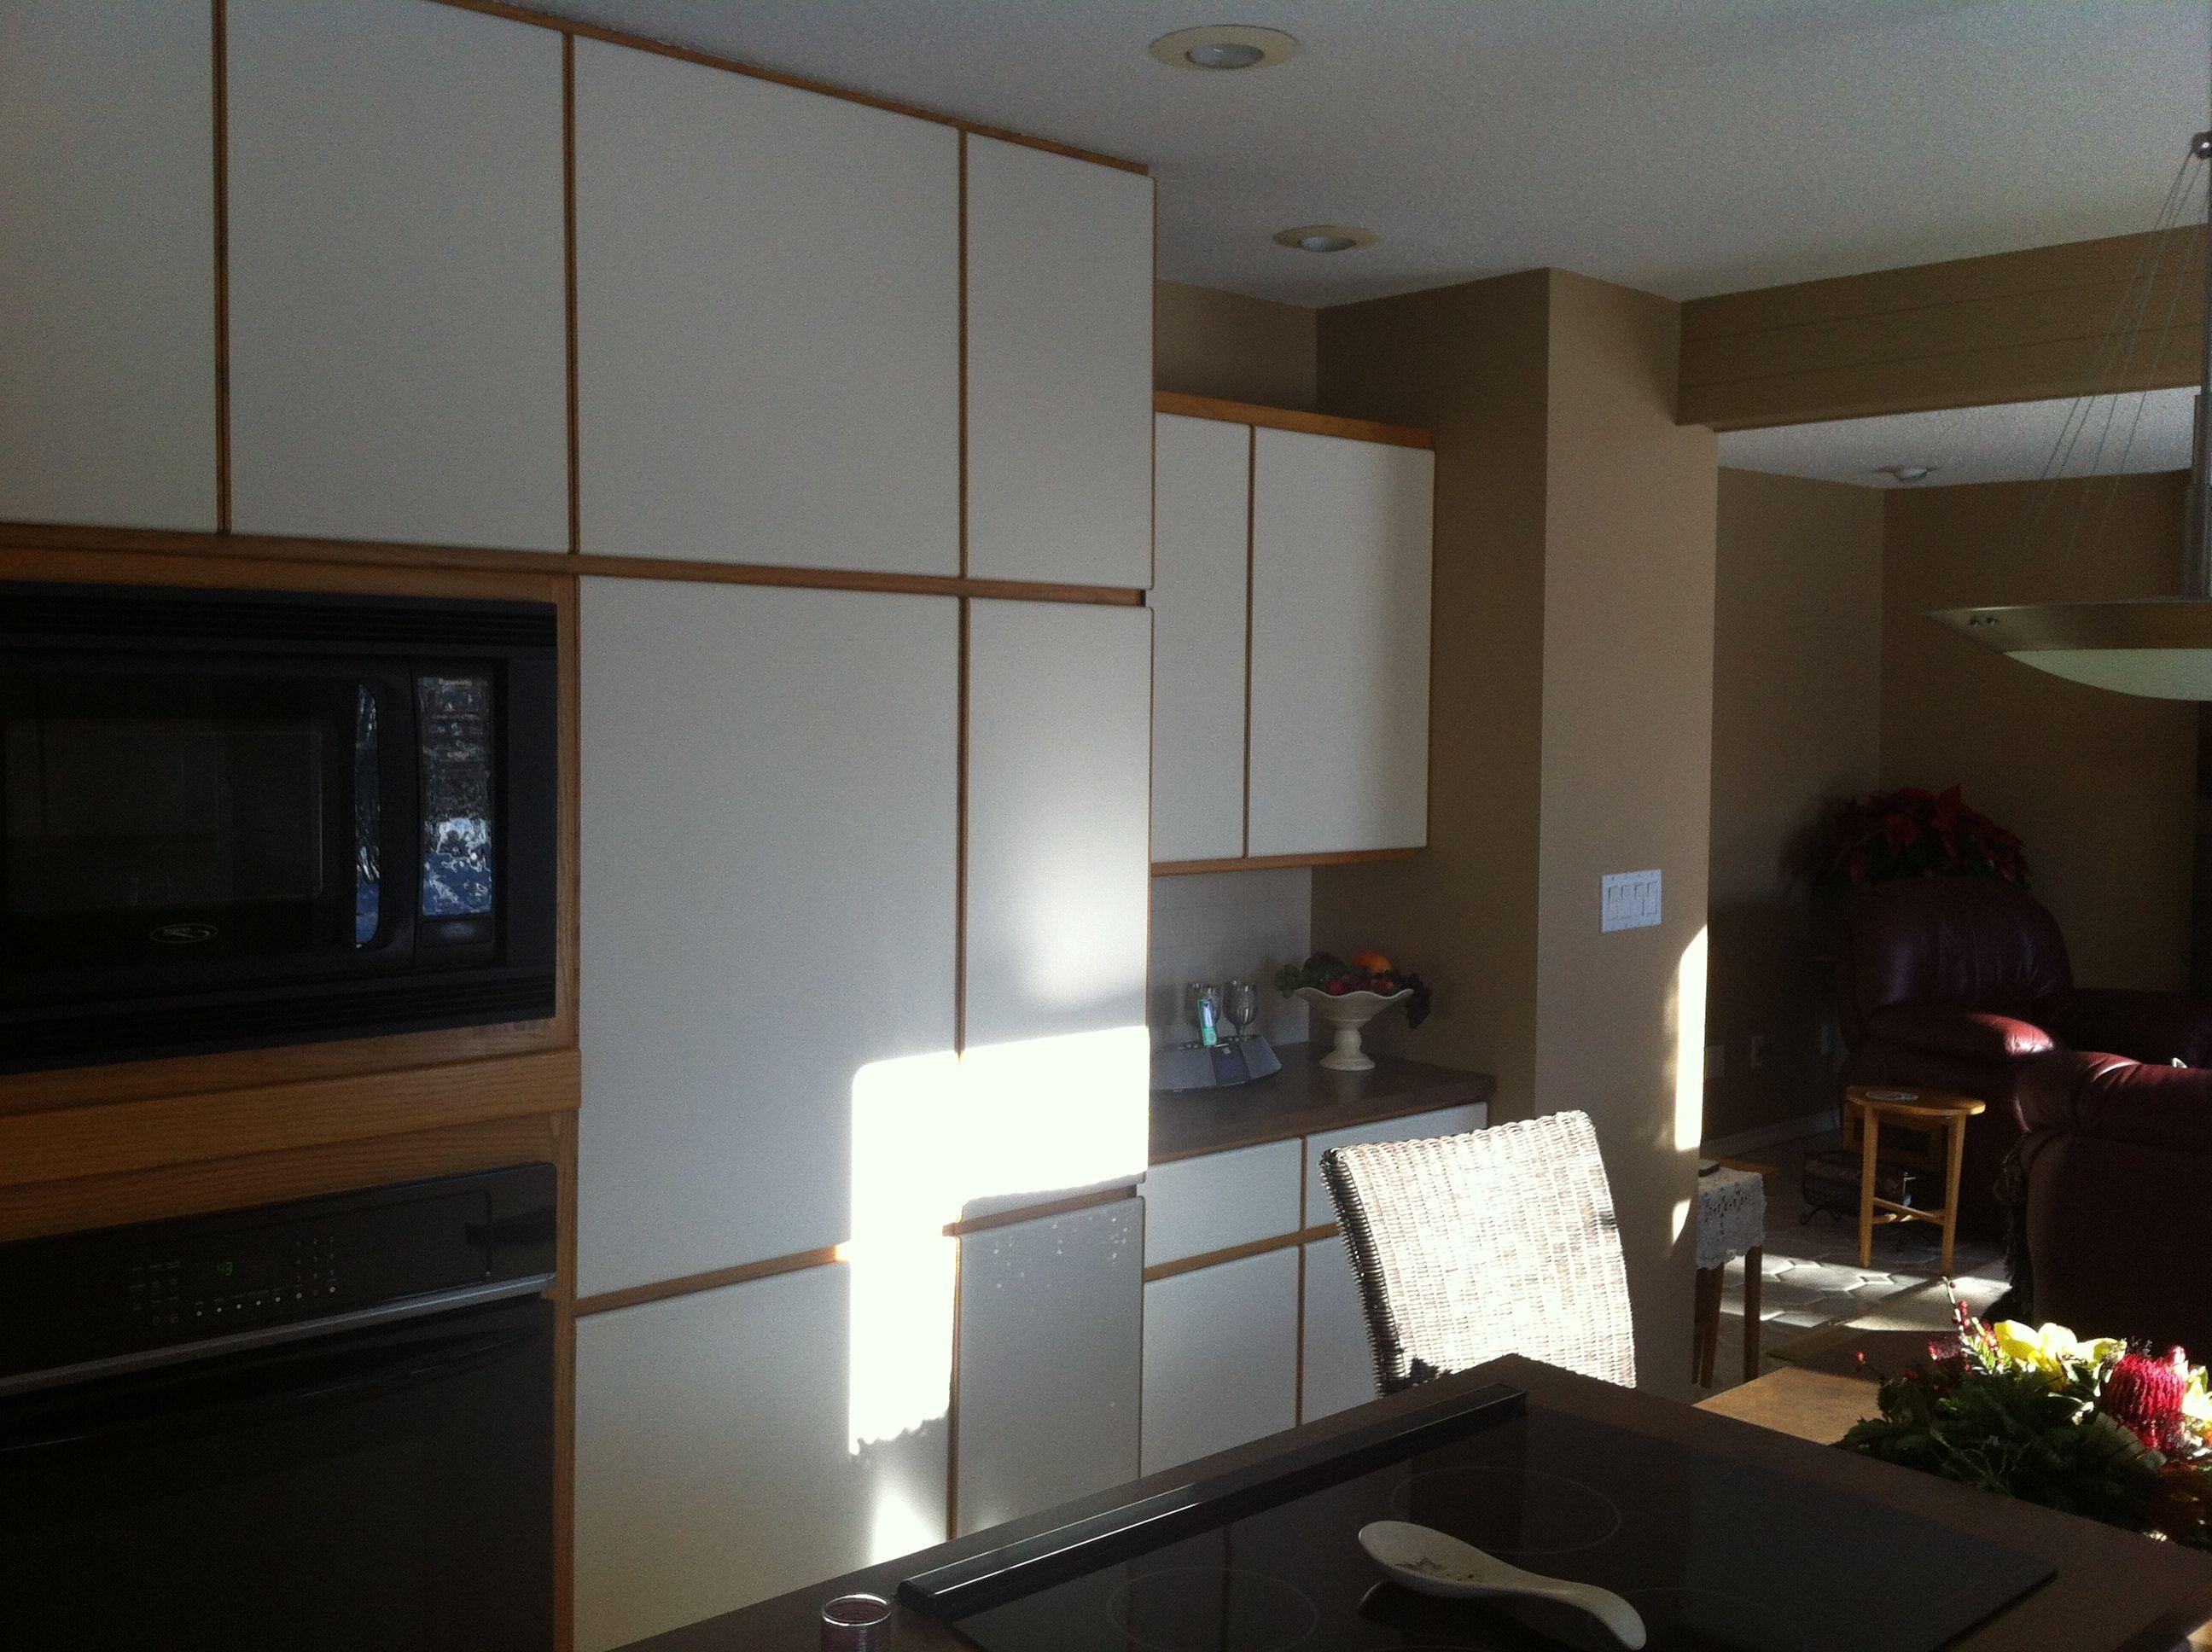 Before Melamine Cabinets And Oak Trim Melamine Cabinets Laminate Cabinet Makeover Painting Melamine